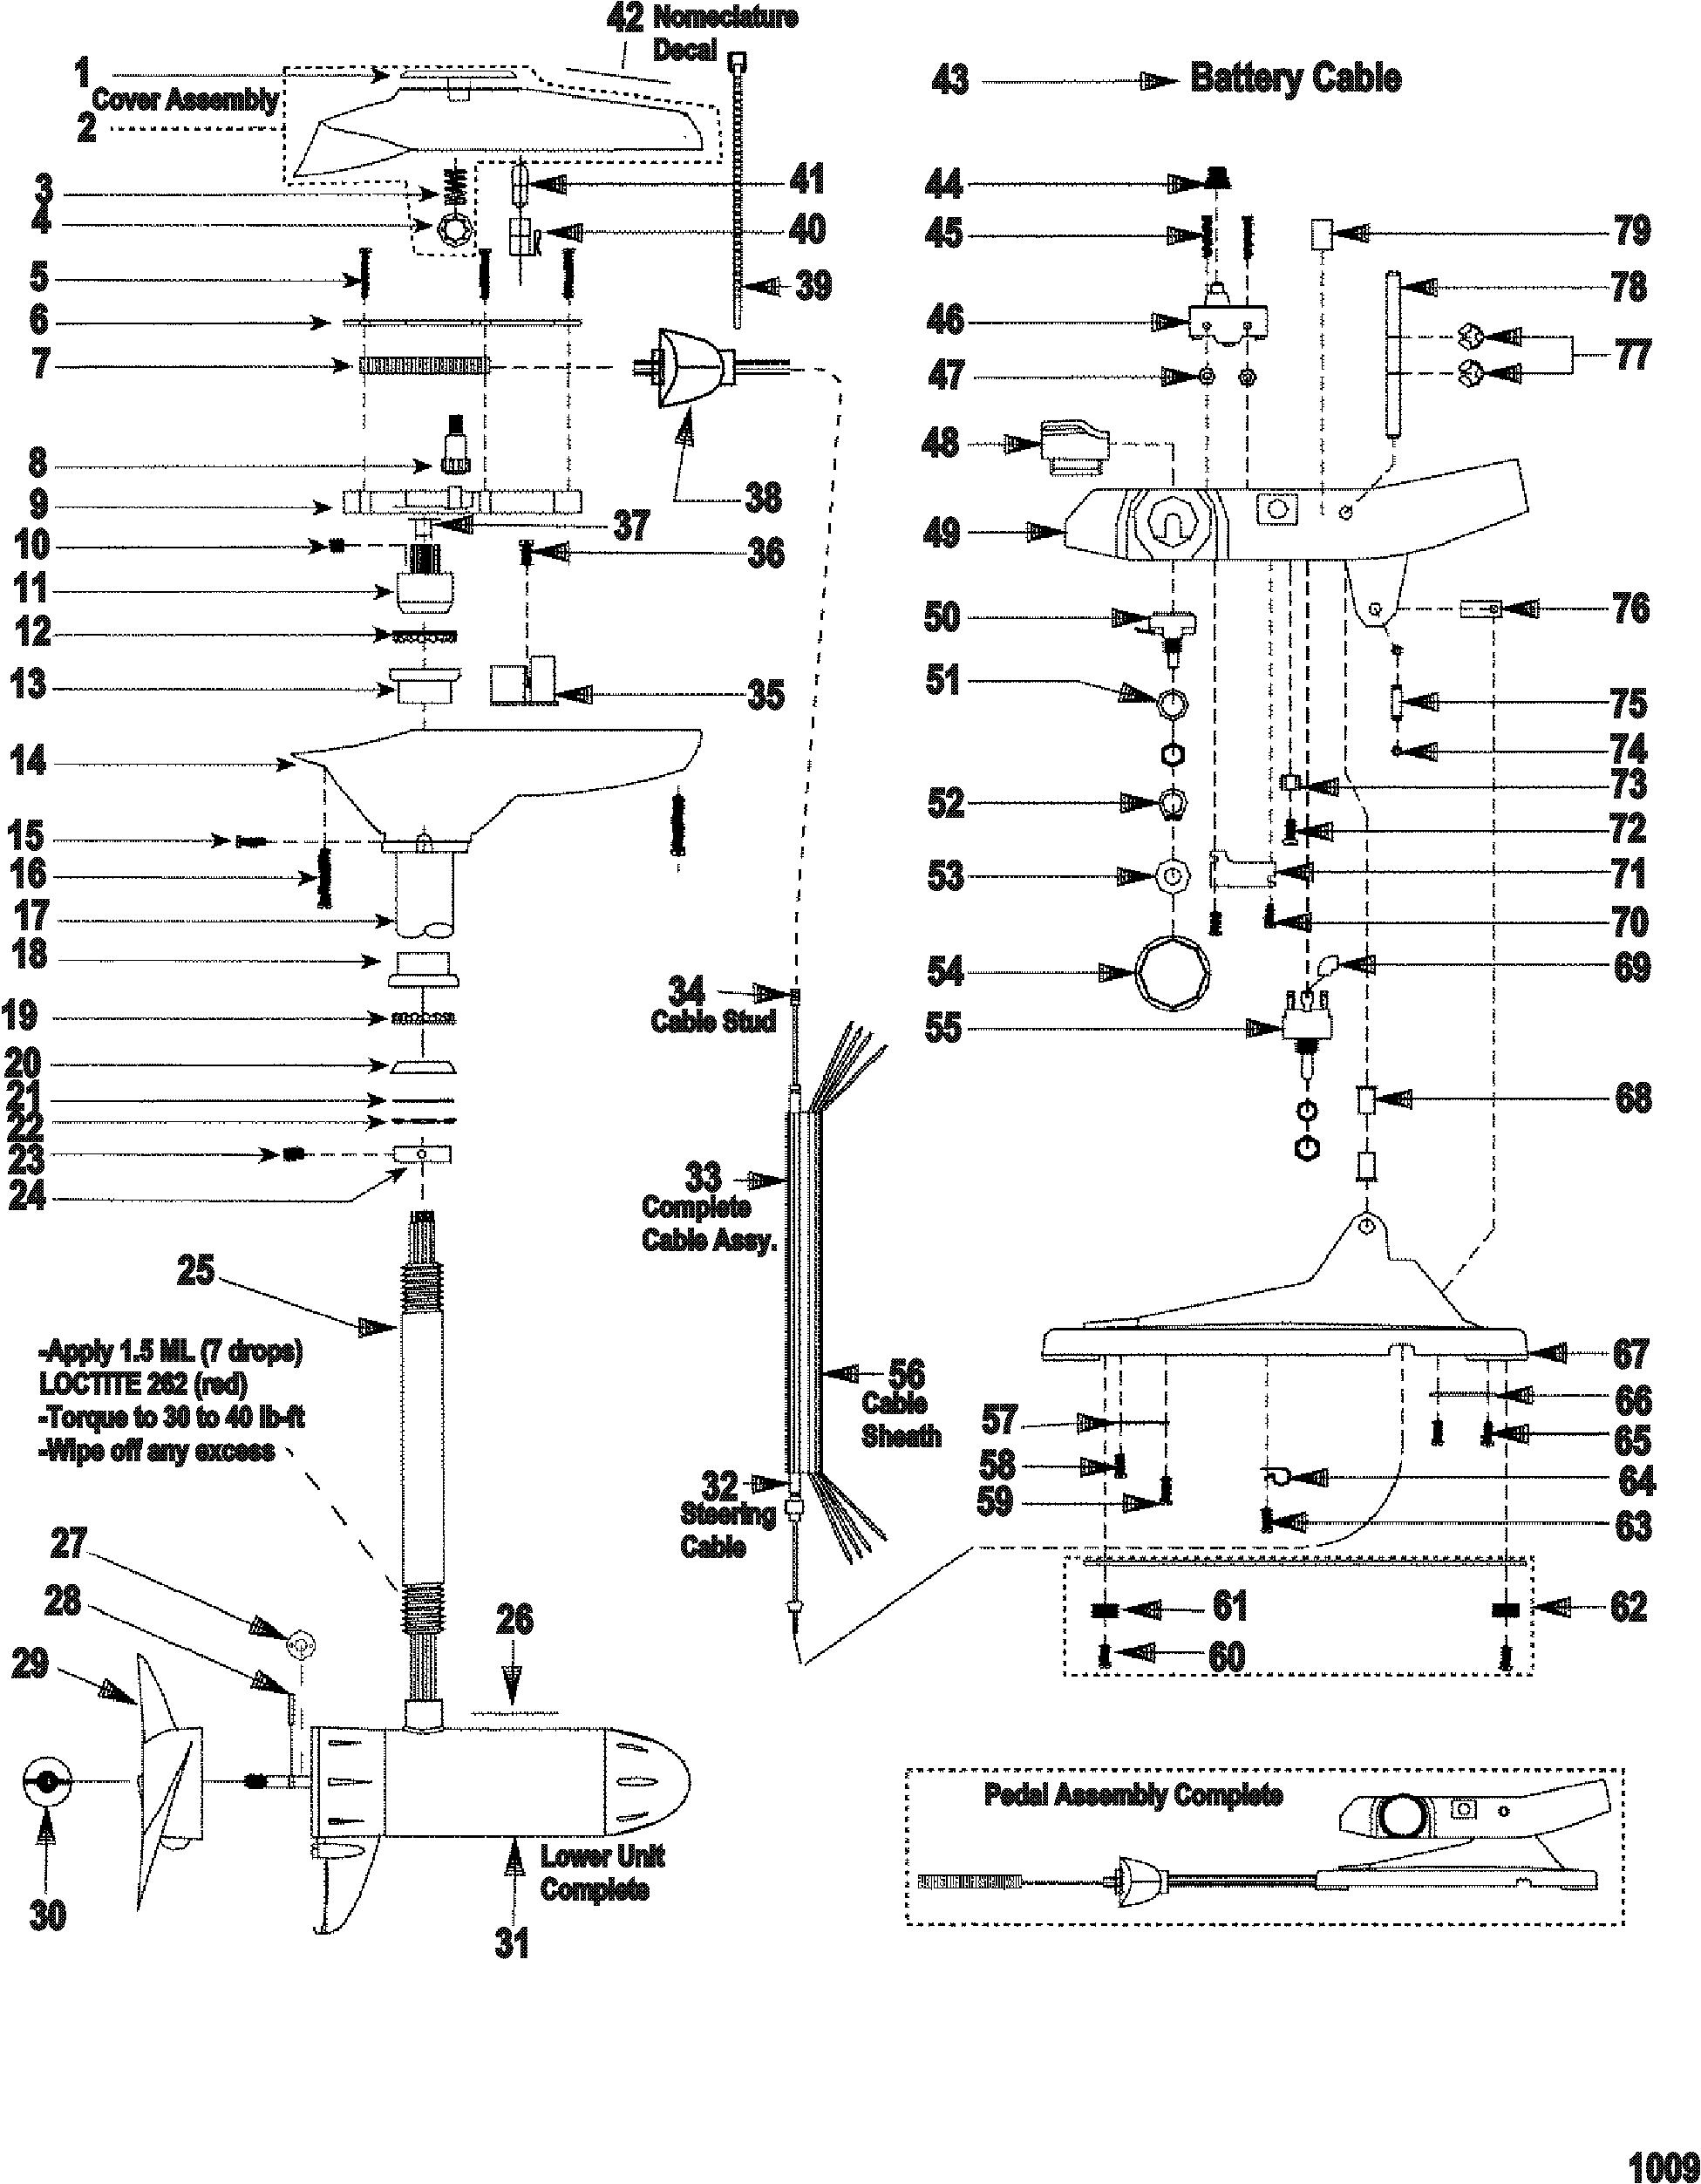 3 Wire Trolling Motor Wiring Diagram Wiring Diagrams Database – Motorguide Trolling Motor Wiring Diagram